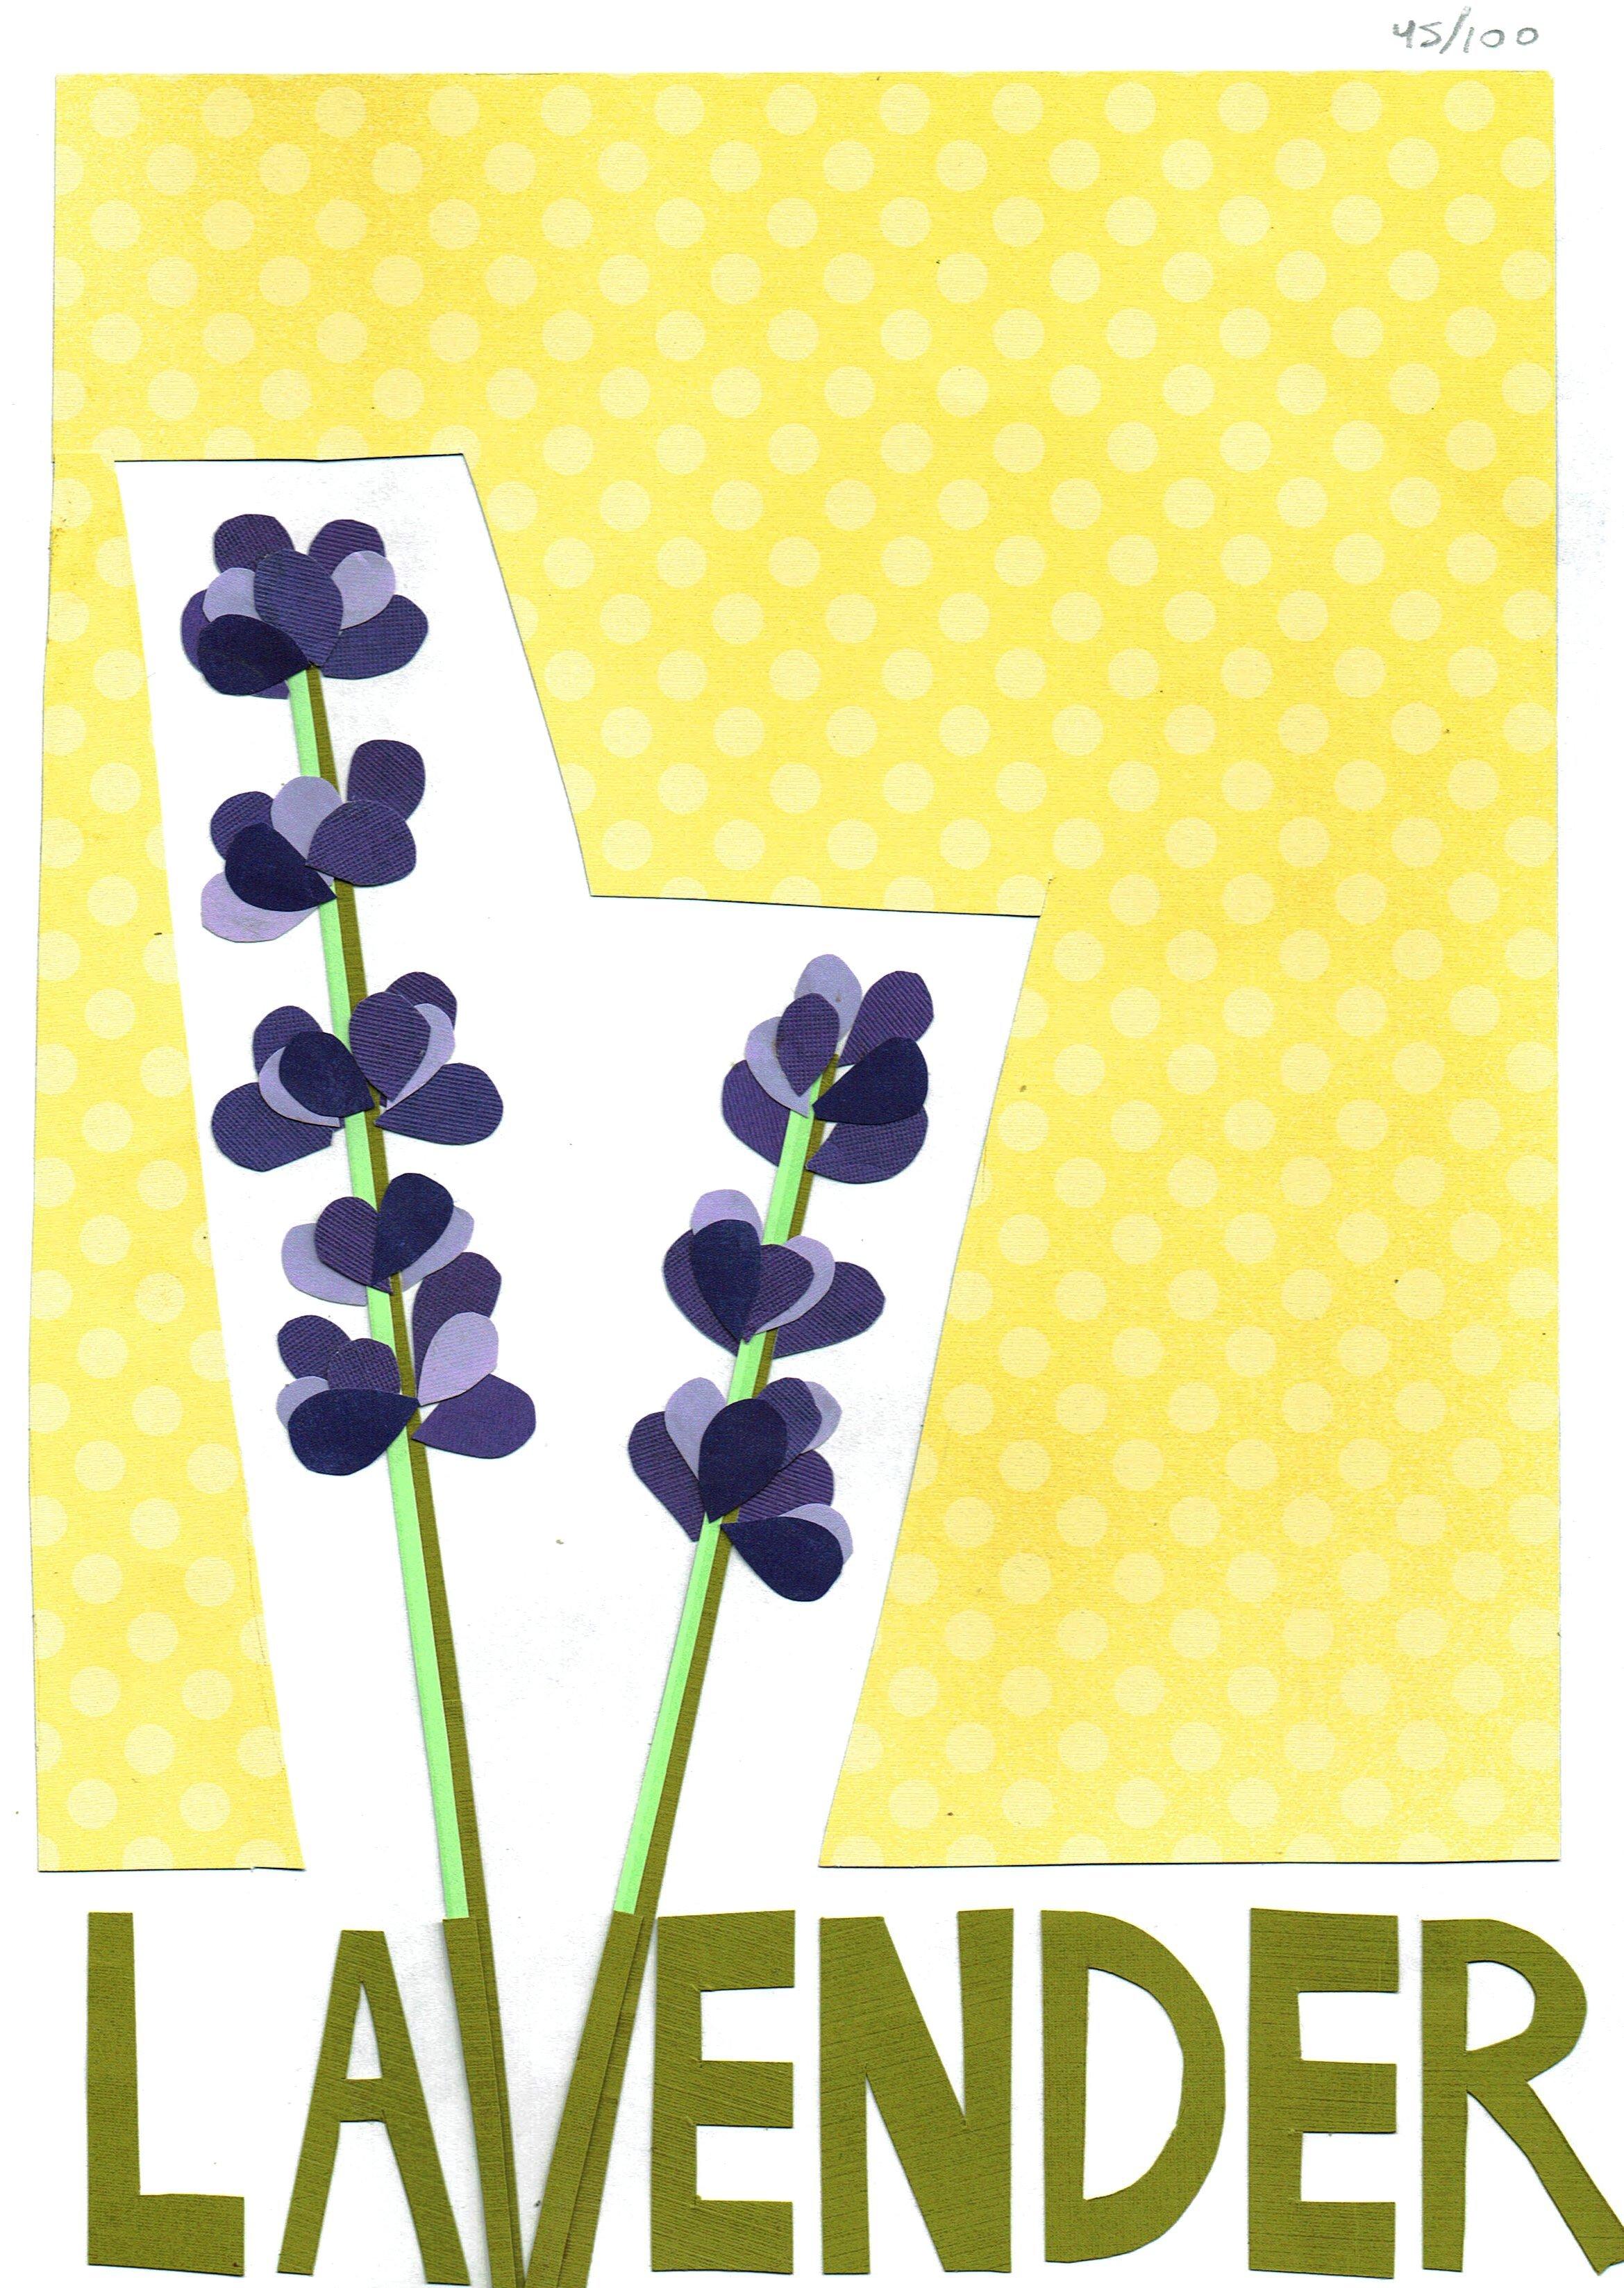 Day 45 - Lavender